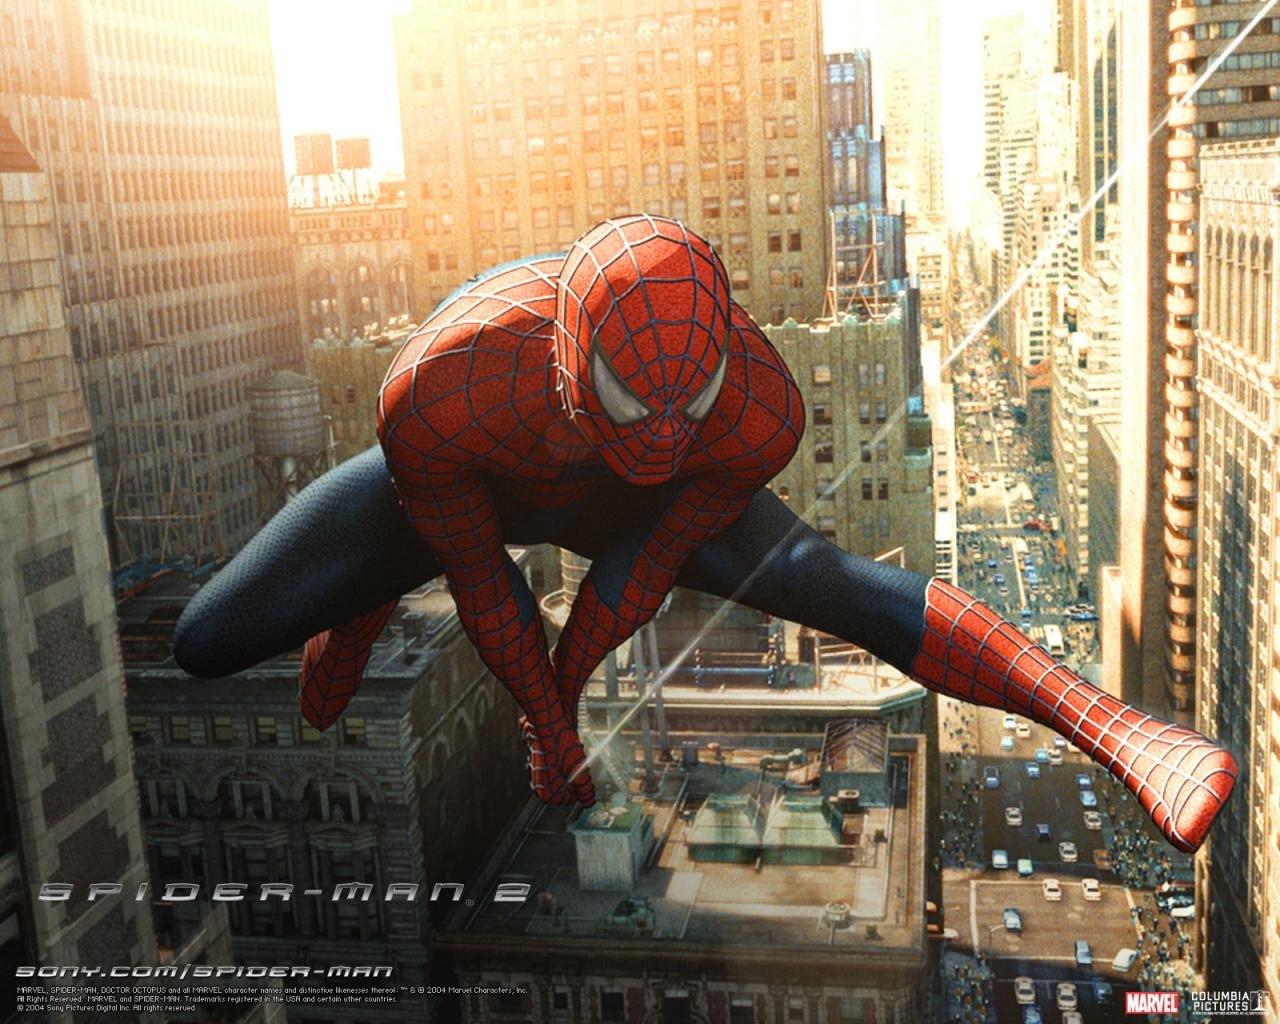 spider-man 2 wallpapers hd for desktop backgrounds